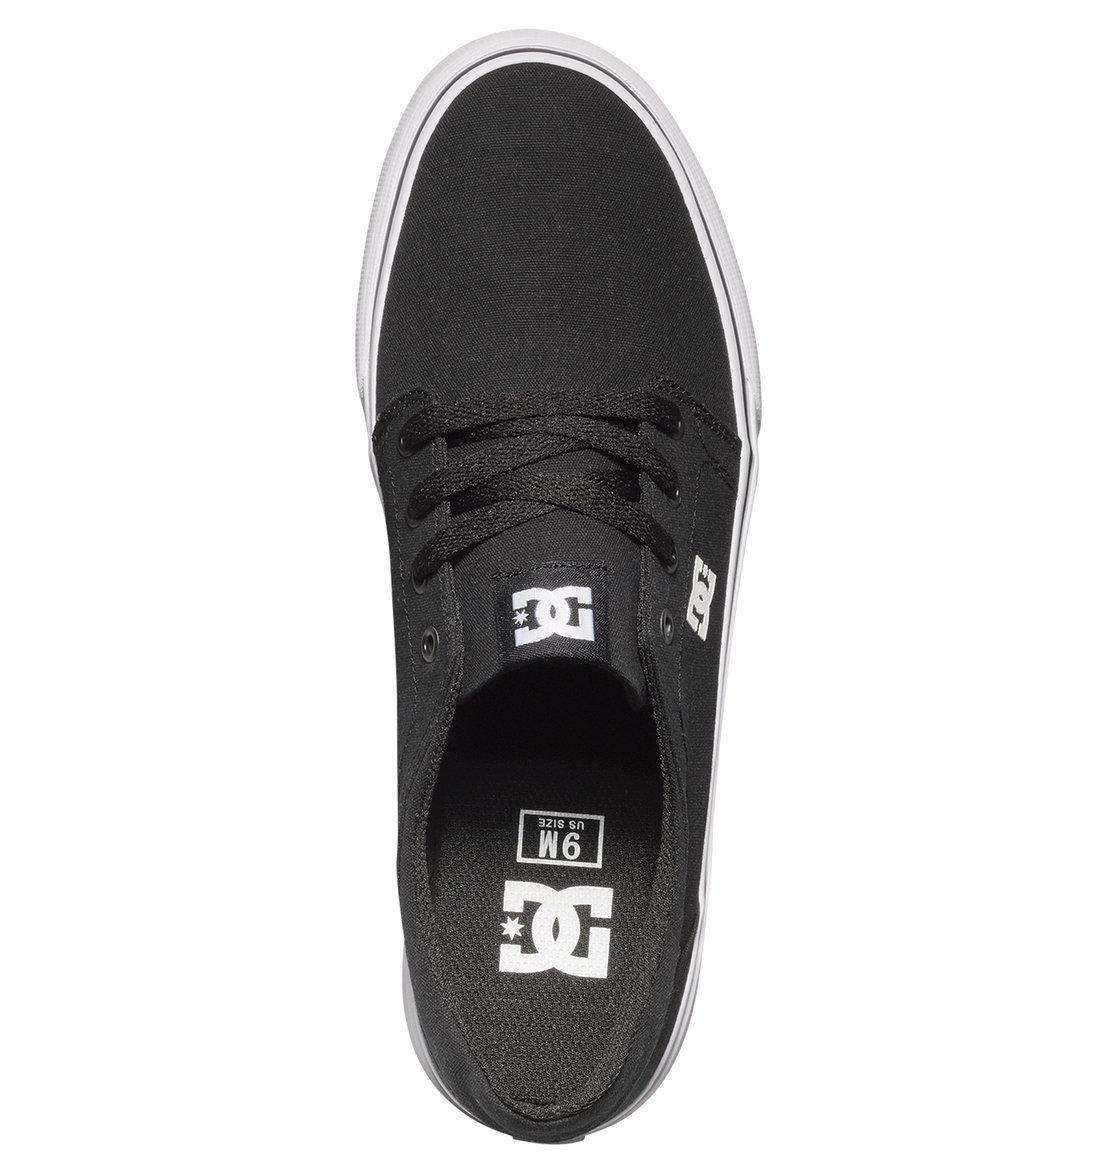 DC Men's Trase TX Unisex Skate Shoe B00L9DT68O 10 B(M) US|Black/White